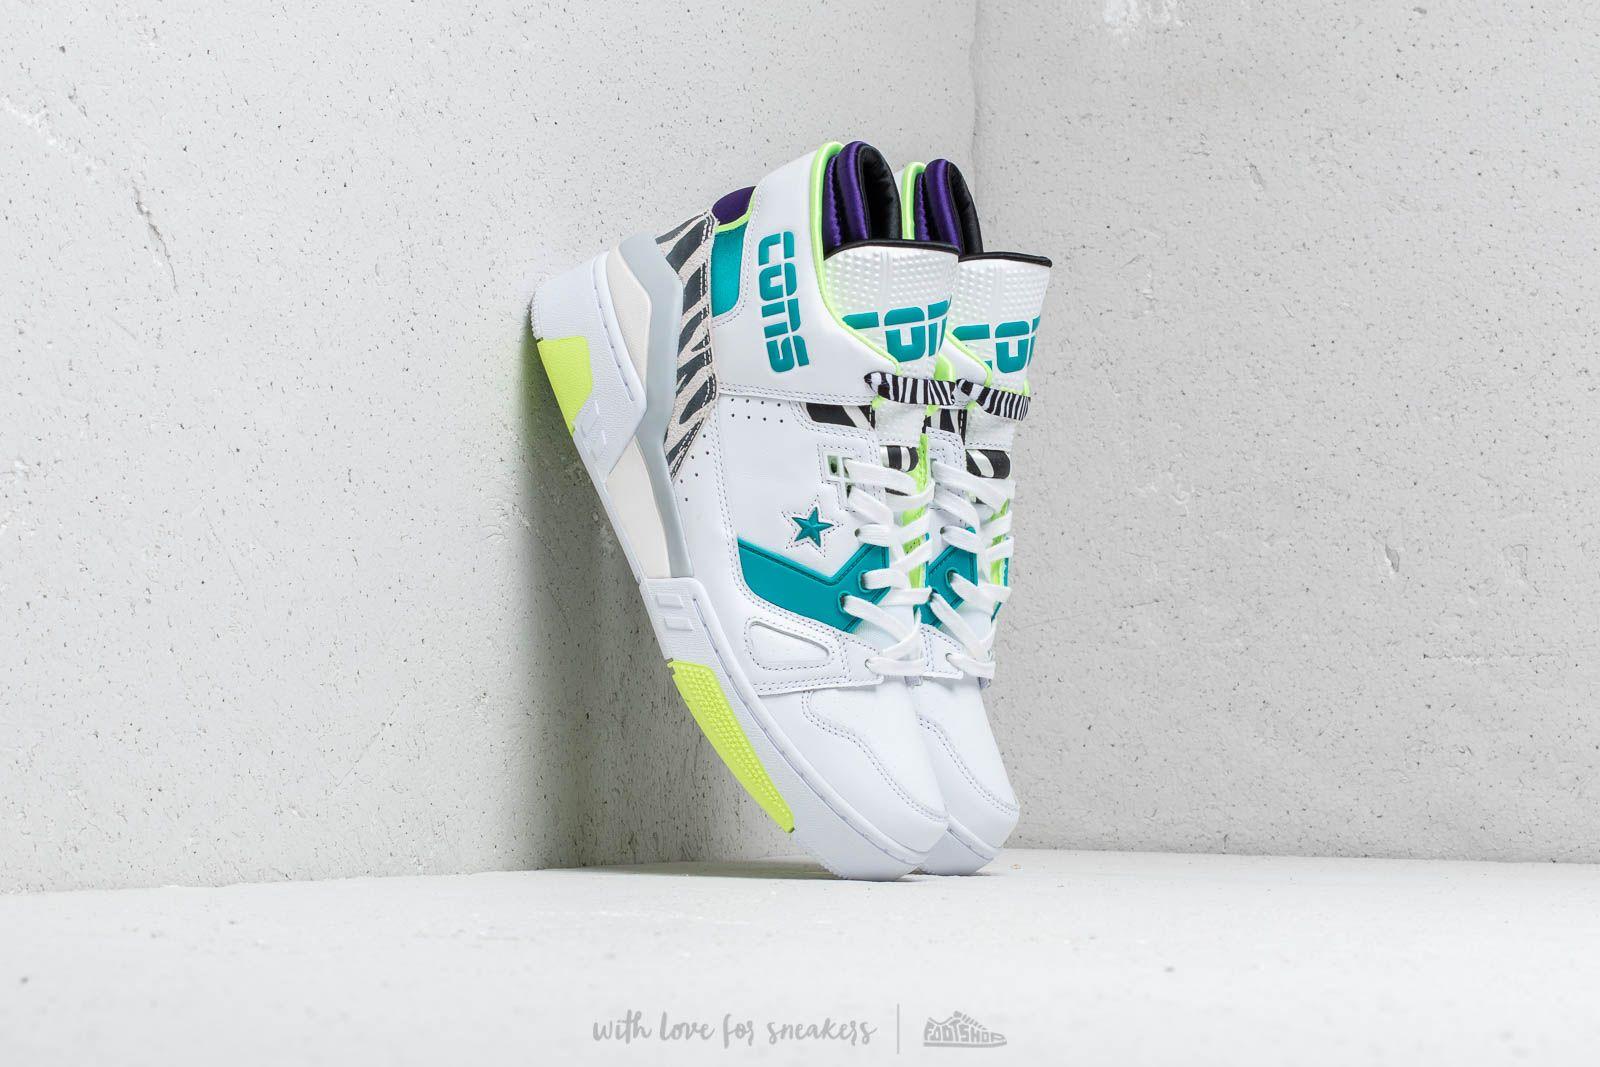 Converse x Don C ERX 260 Mid White/ Rapid Teal/ Court Purple za skvelú cenu 121 € kúpite na Footshop.sk